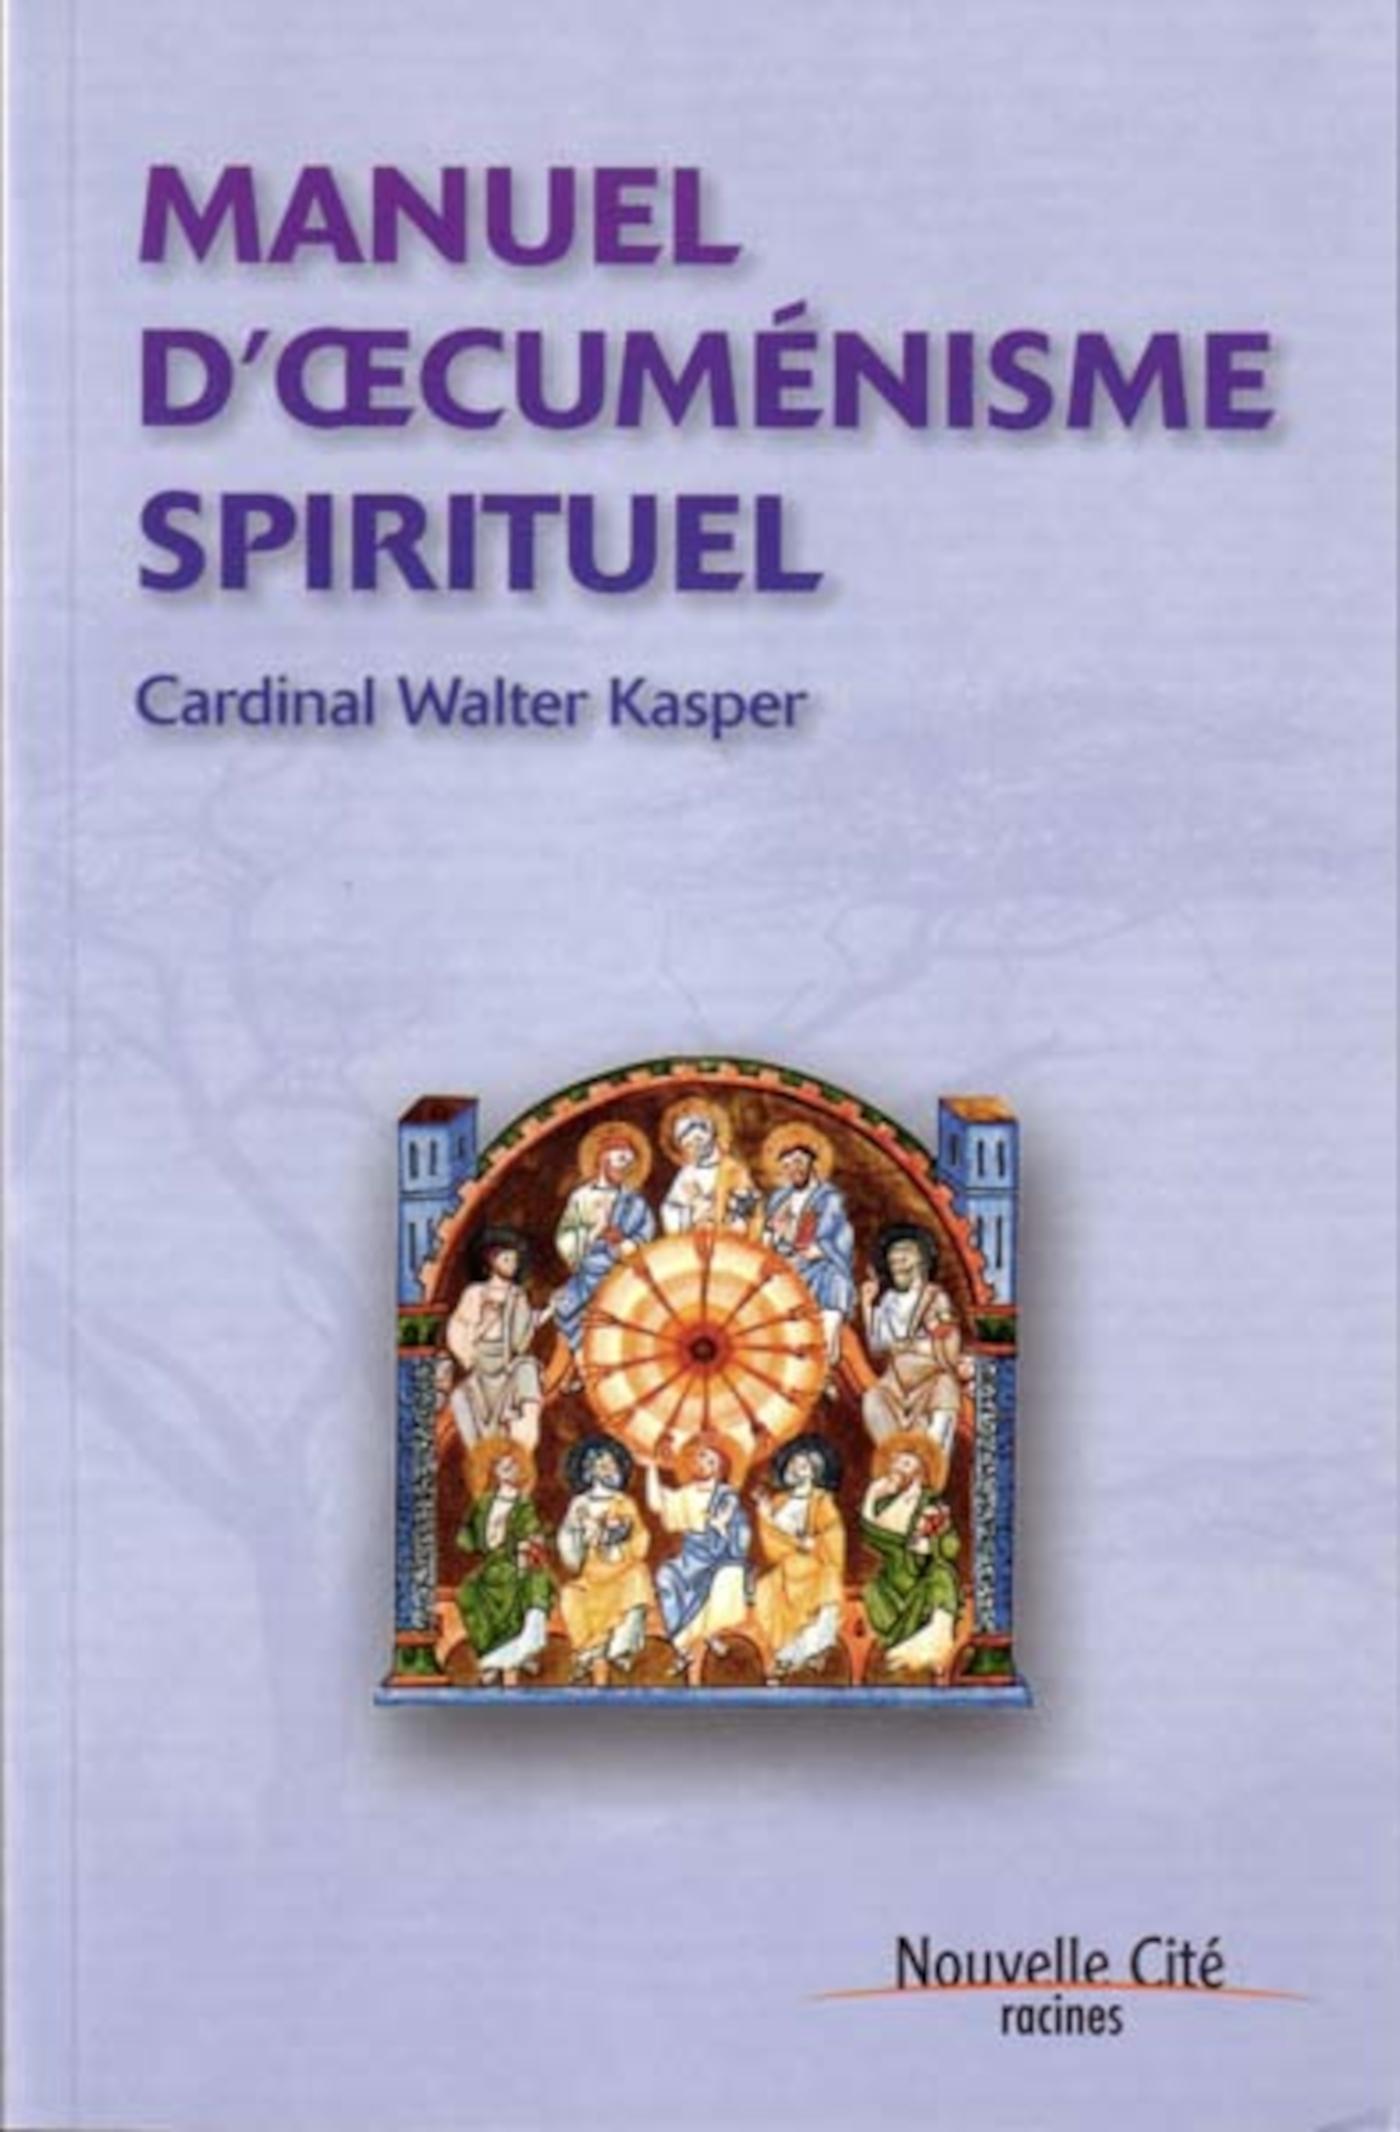 MANUEL D'OECUMENISME SPIRITUEL